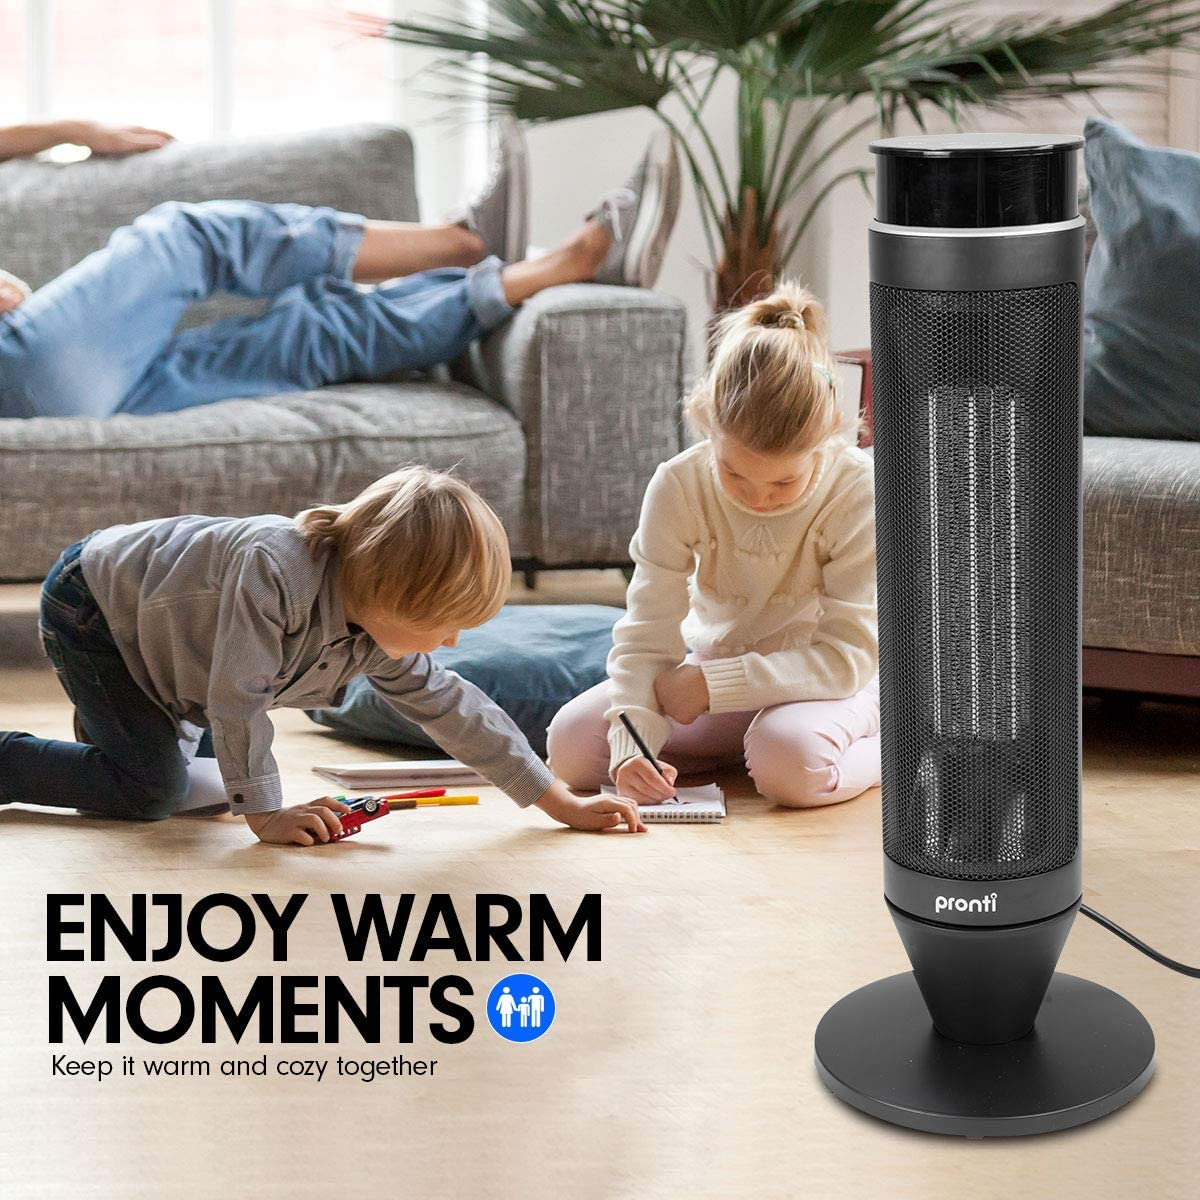 Pronti2000W Electric Heater